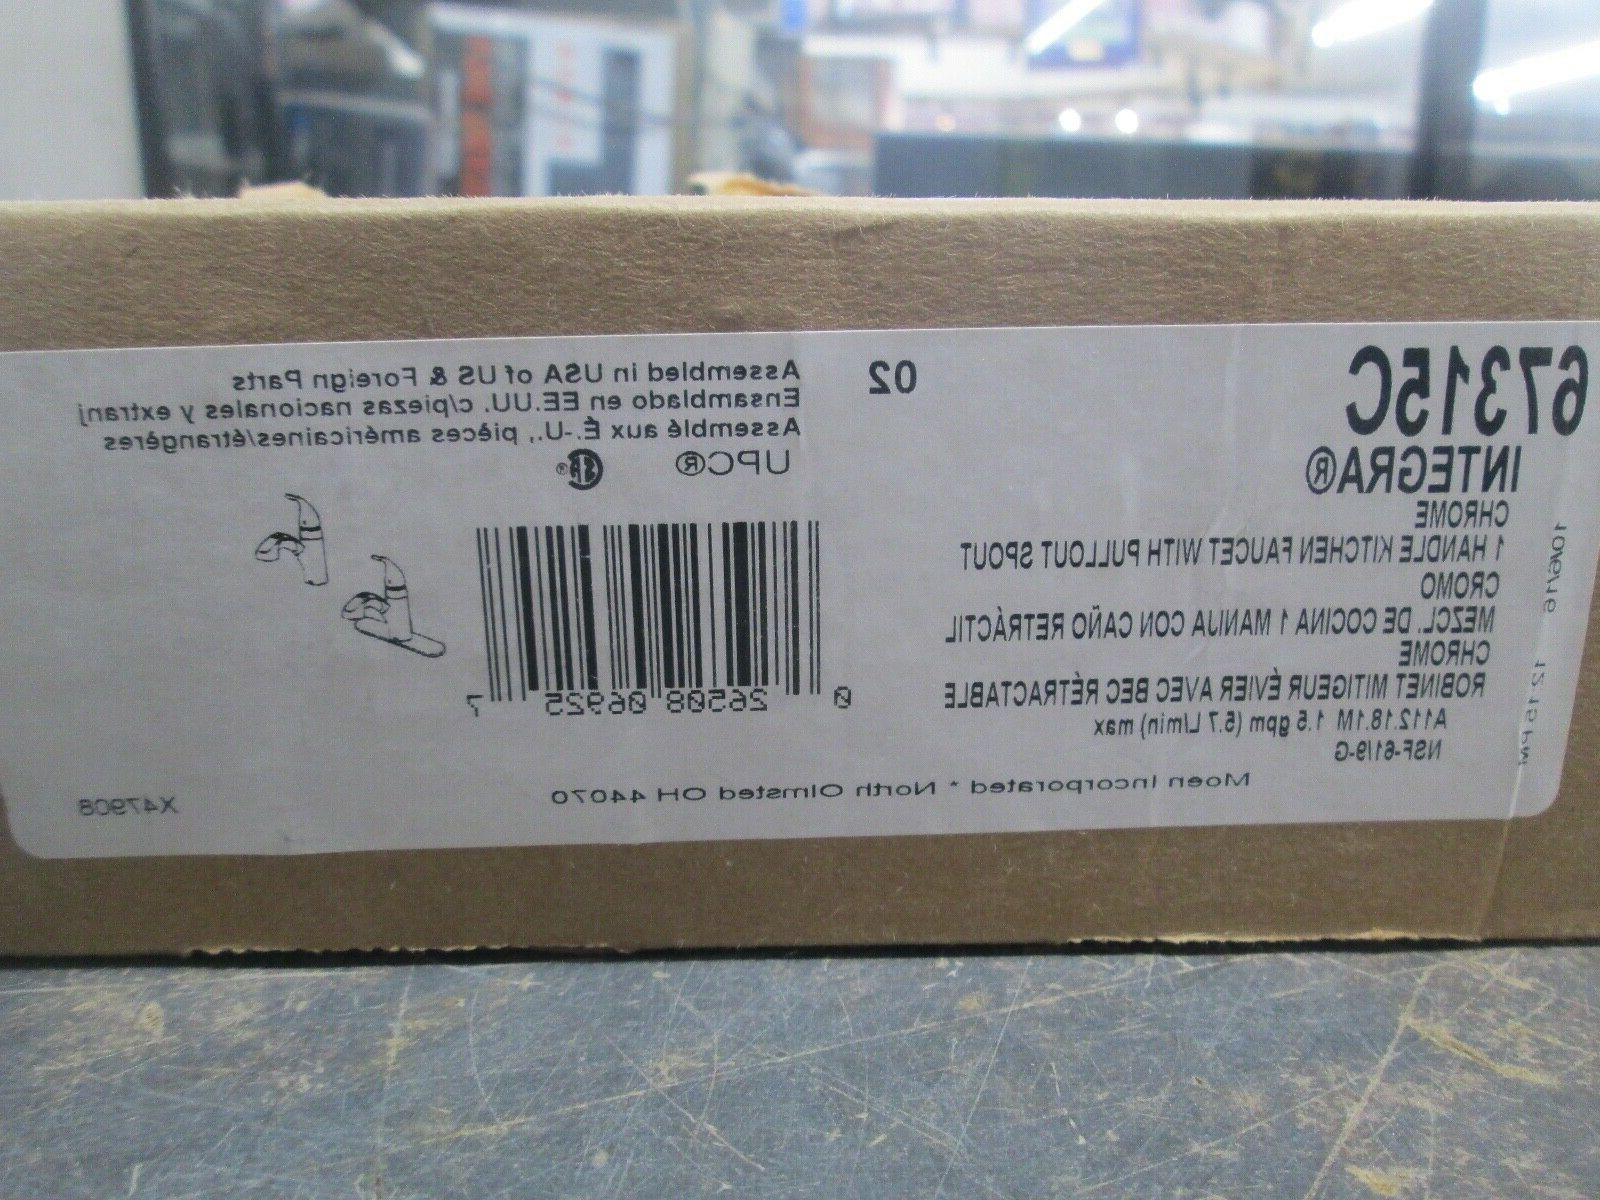 67315c chrome one handle pullout kitchen faucet